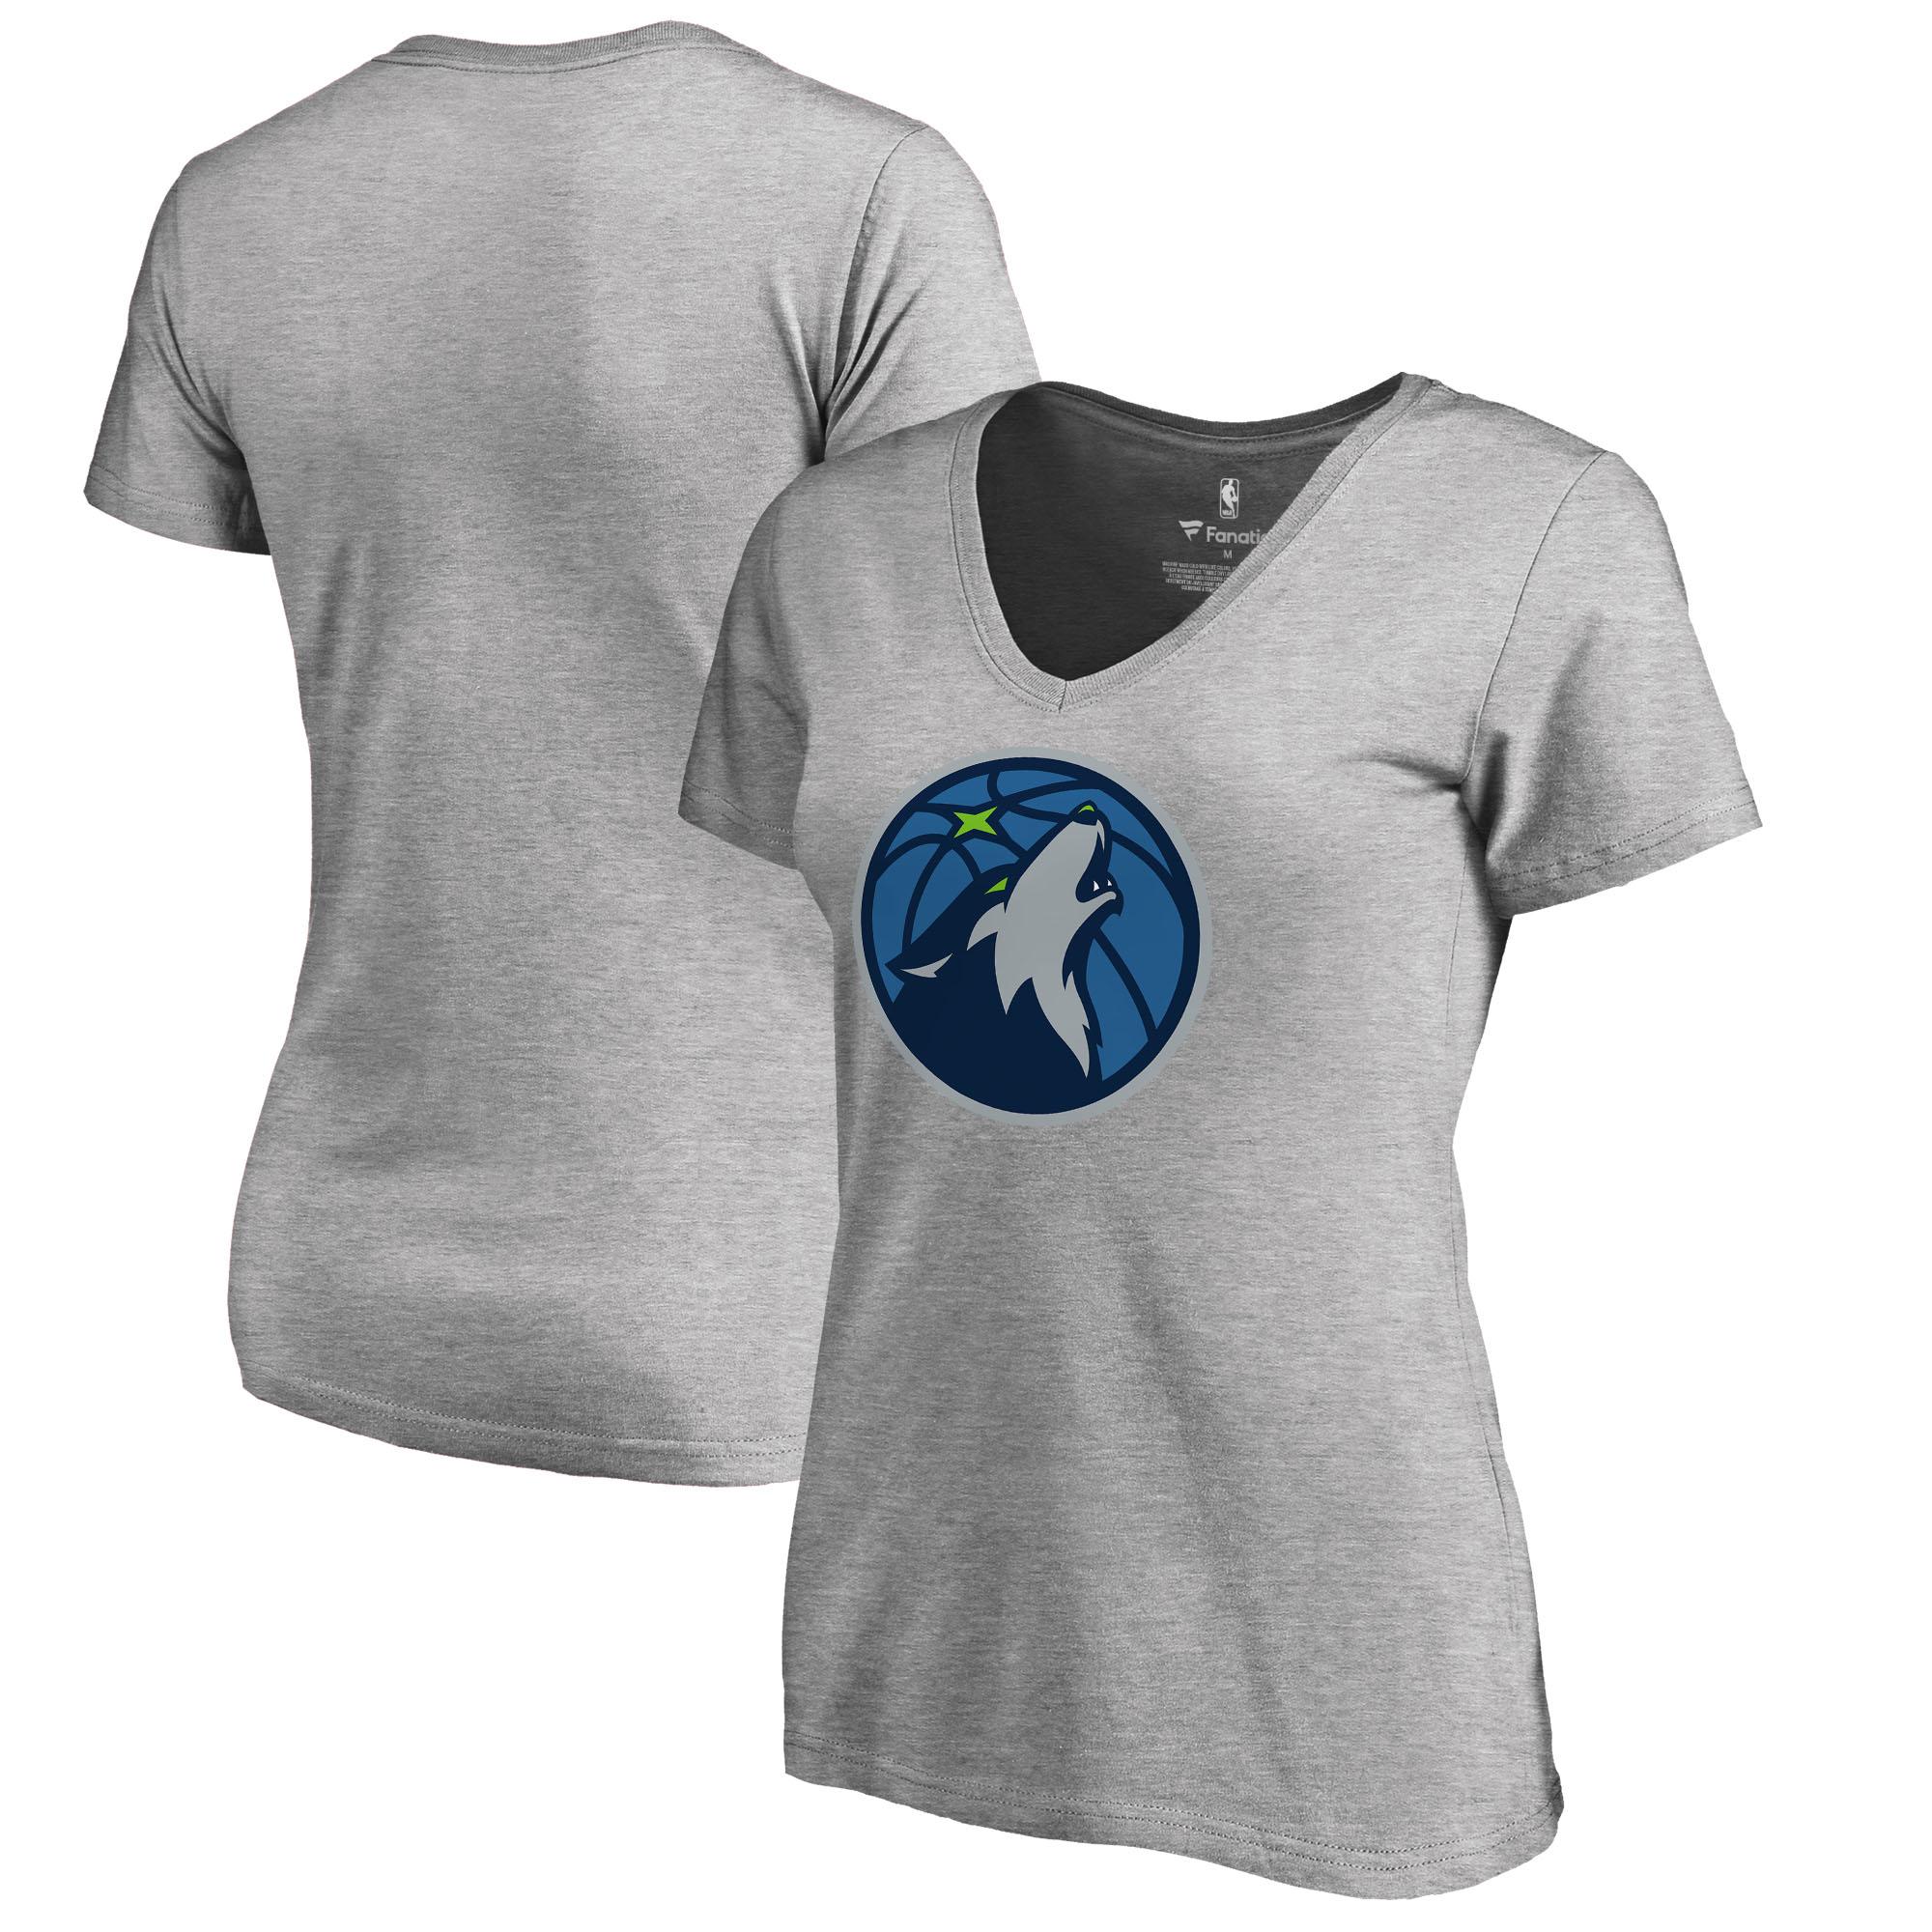 Minnesota Timberwolves Fanatics Branded Women's Primary Logo V-Neck T-Shirt - Ash